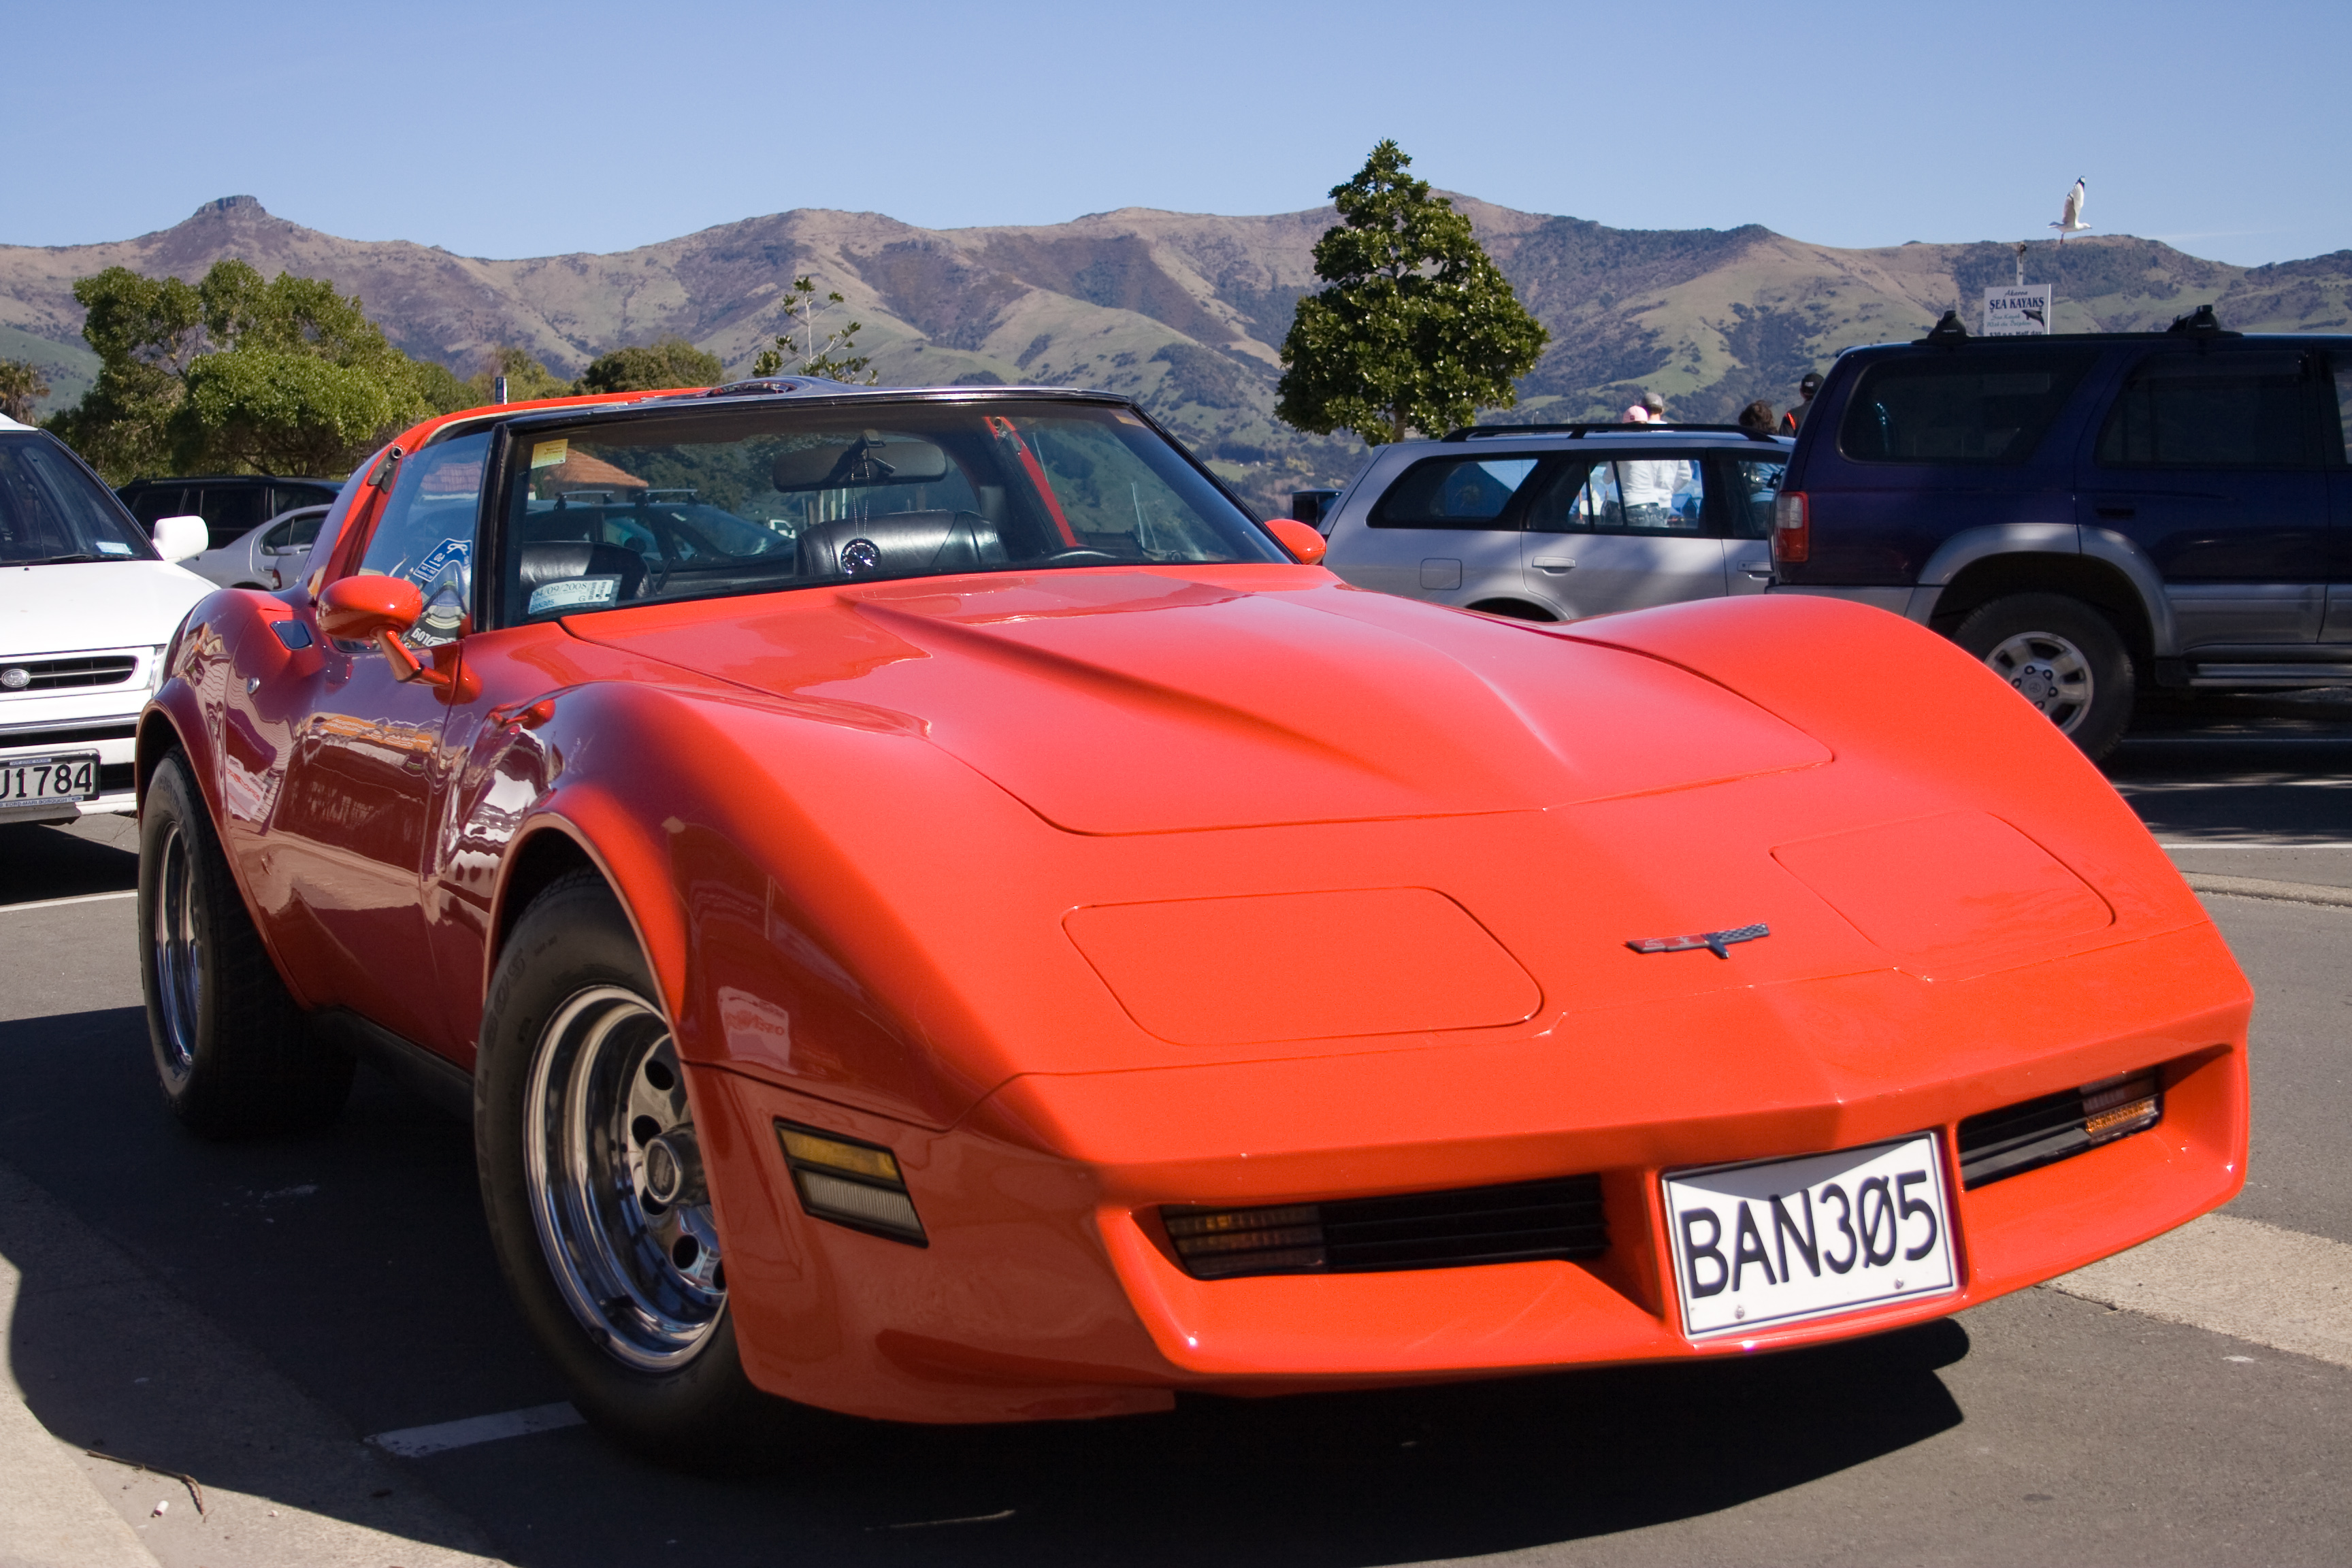 1980 chevrolet corvette c3 classic automobiles. Black Bedroom Furniture Sets. Home Design Ideas